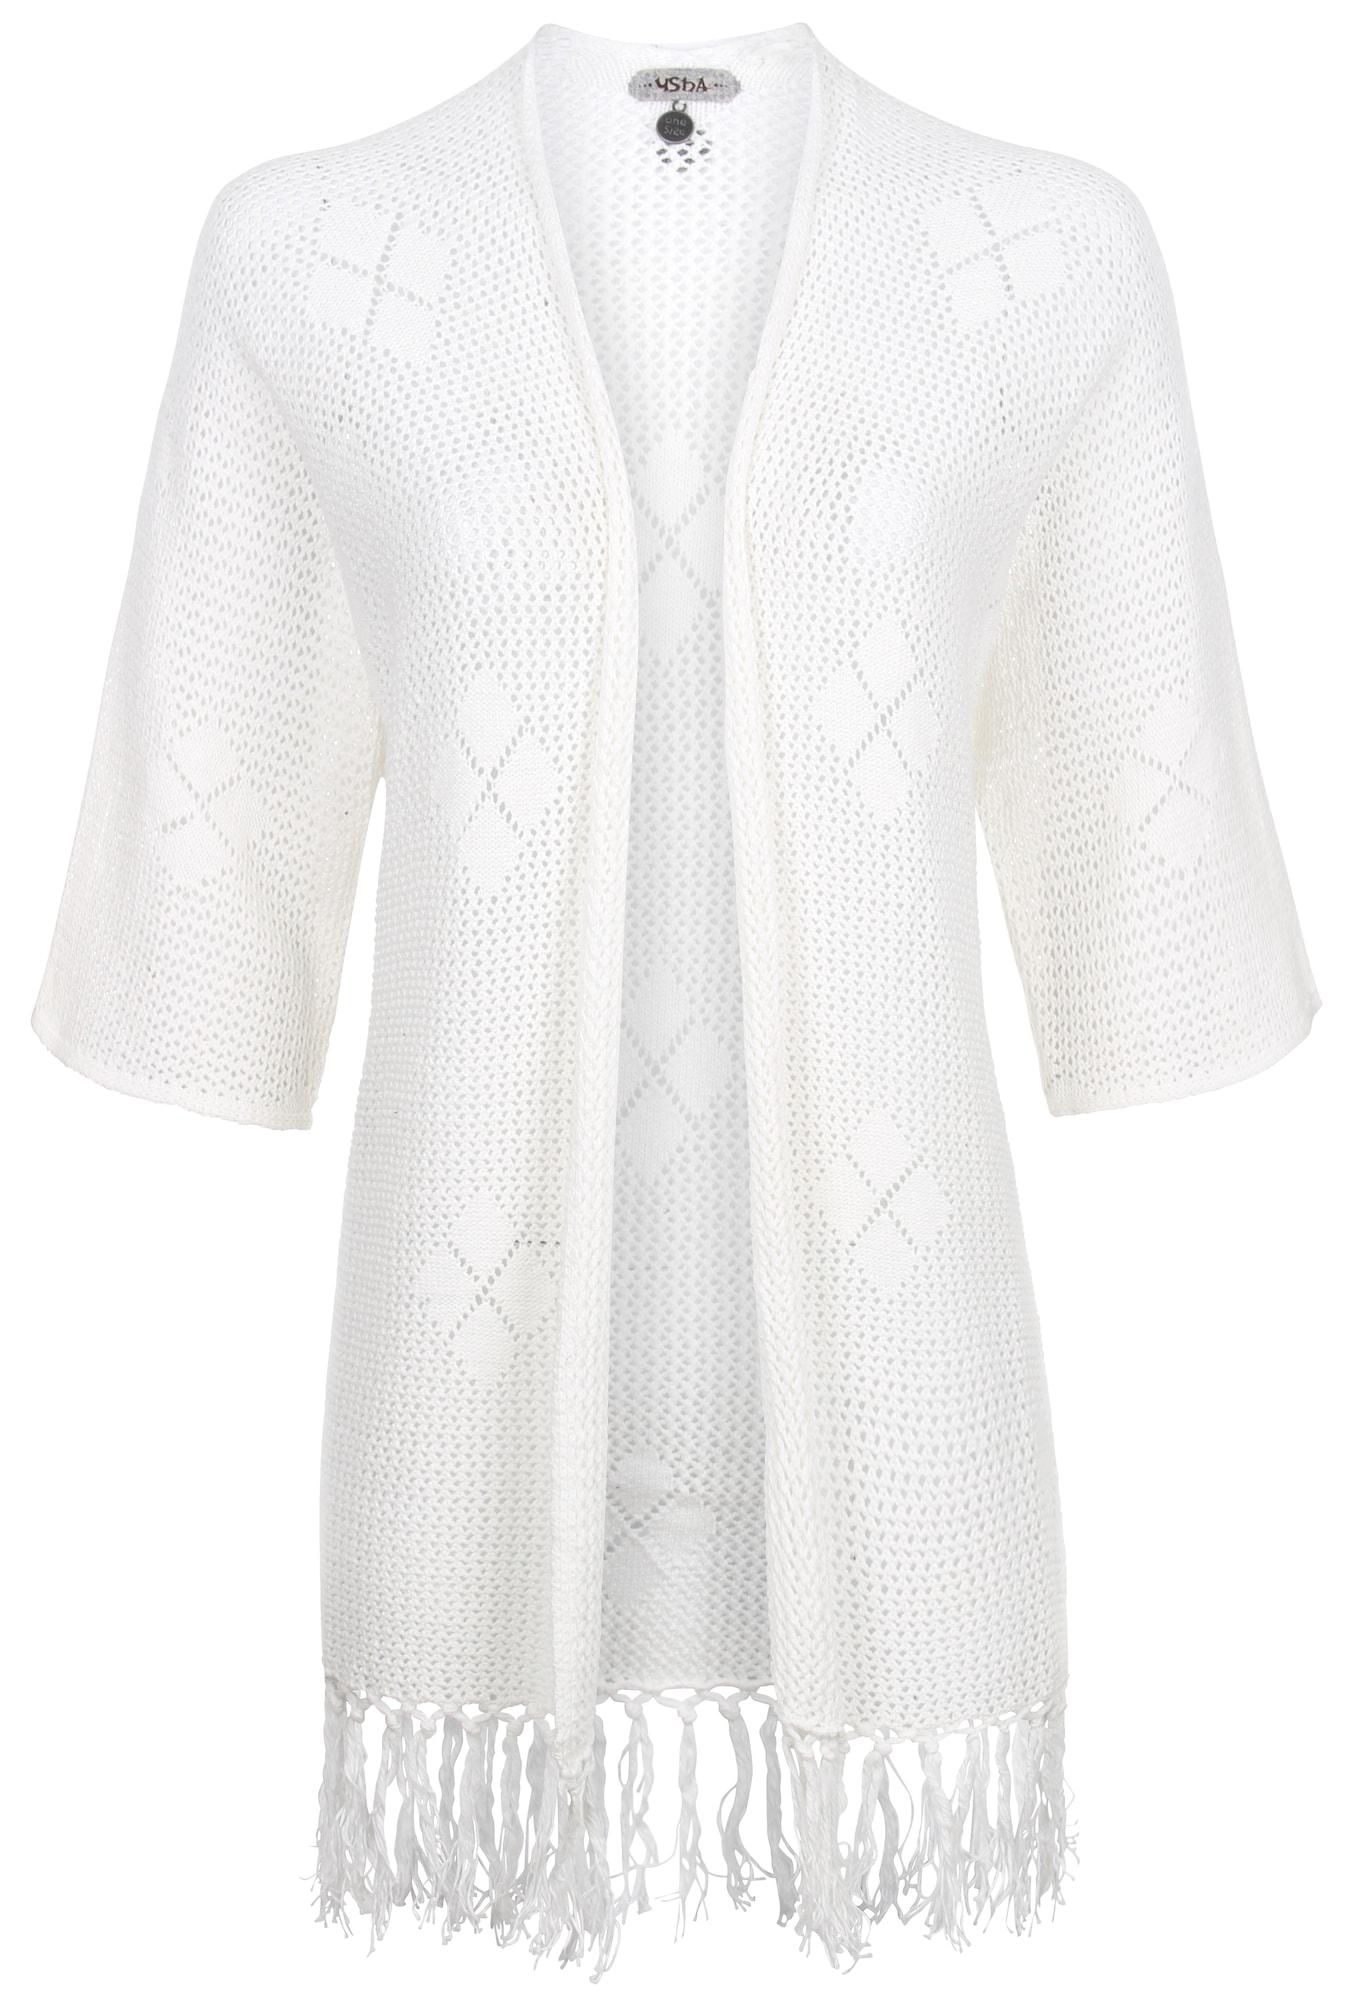 Poncho | Bekleidung > Pullover > Ponchos & Capes | Usha